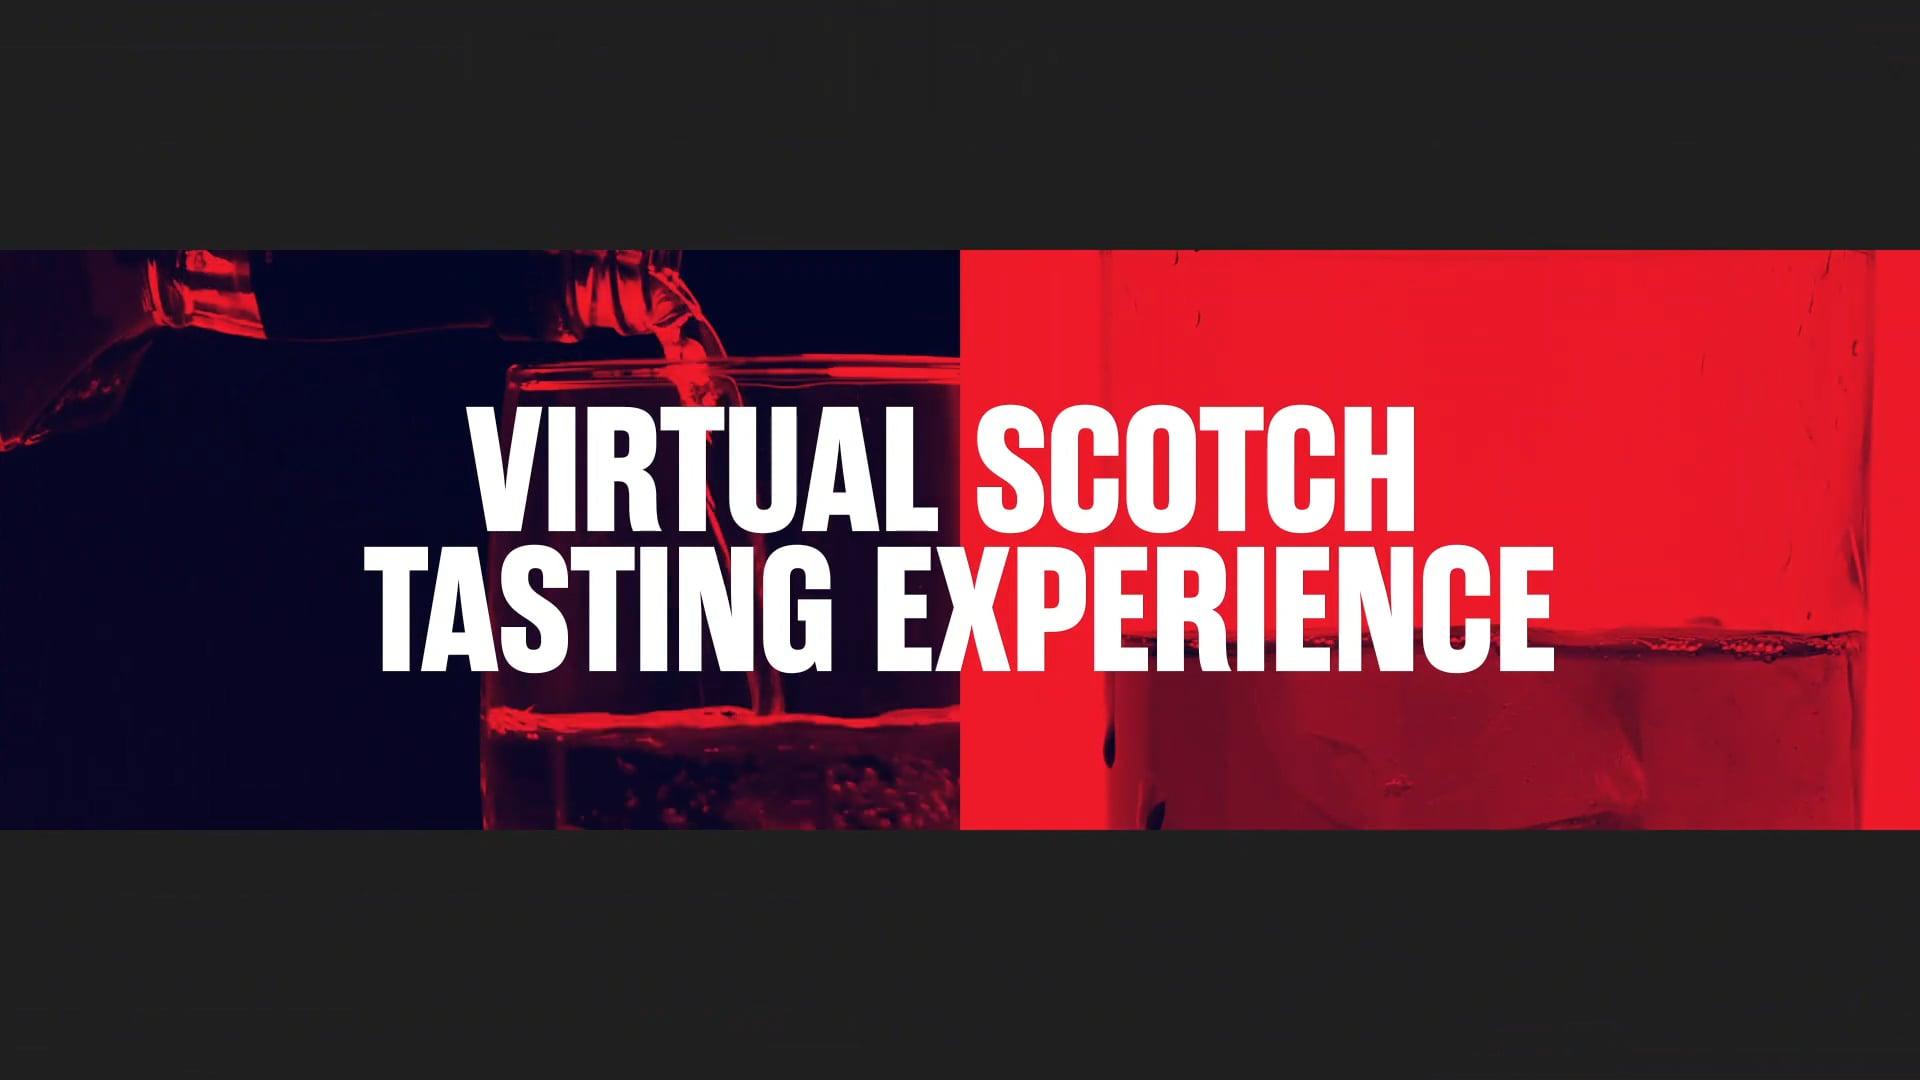 Virtual Scotch Tasting